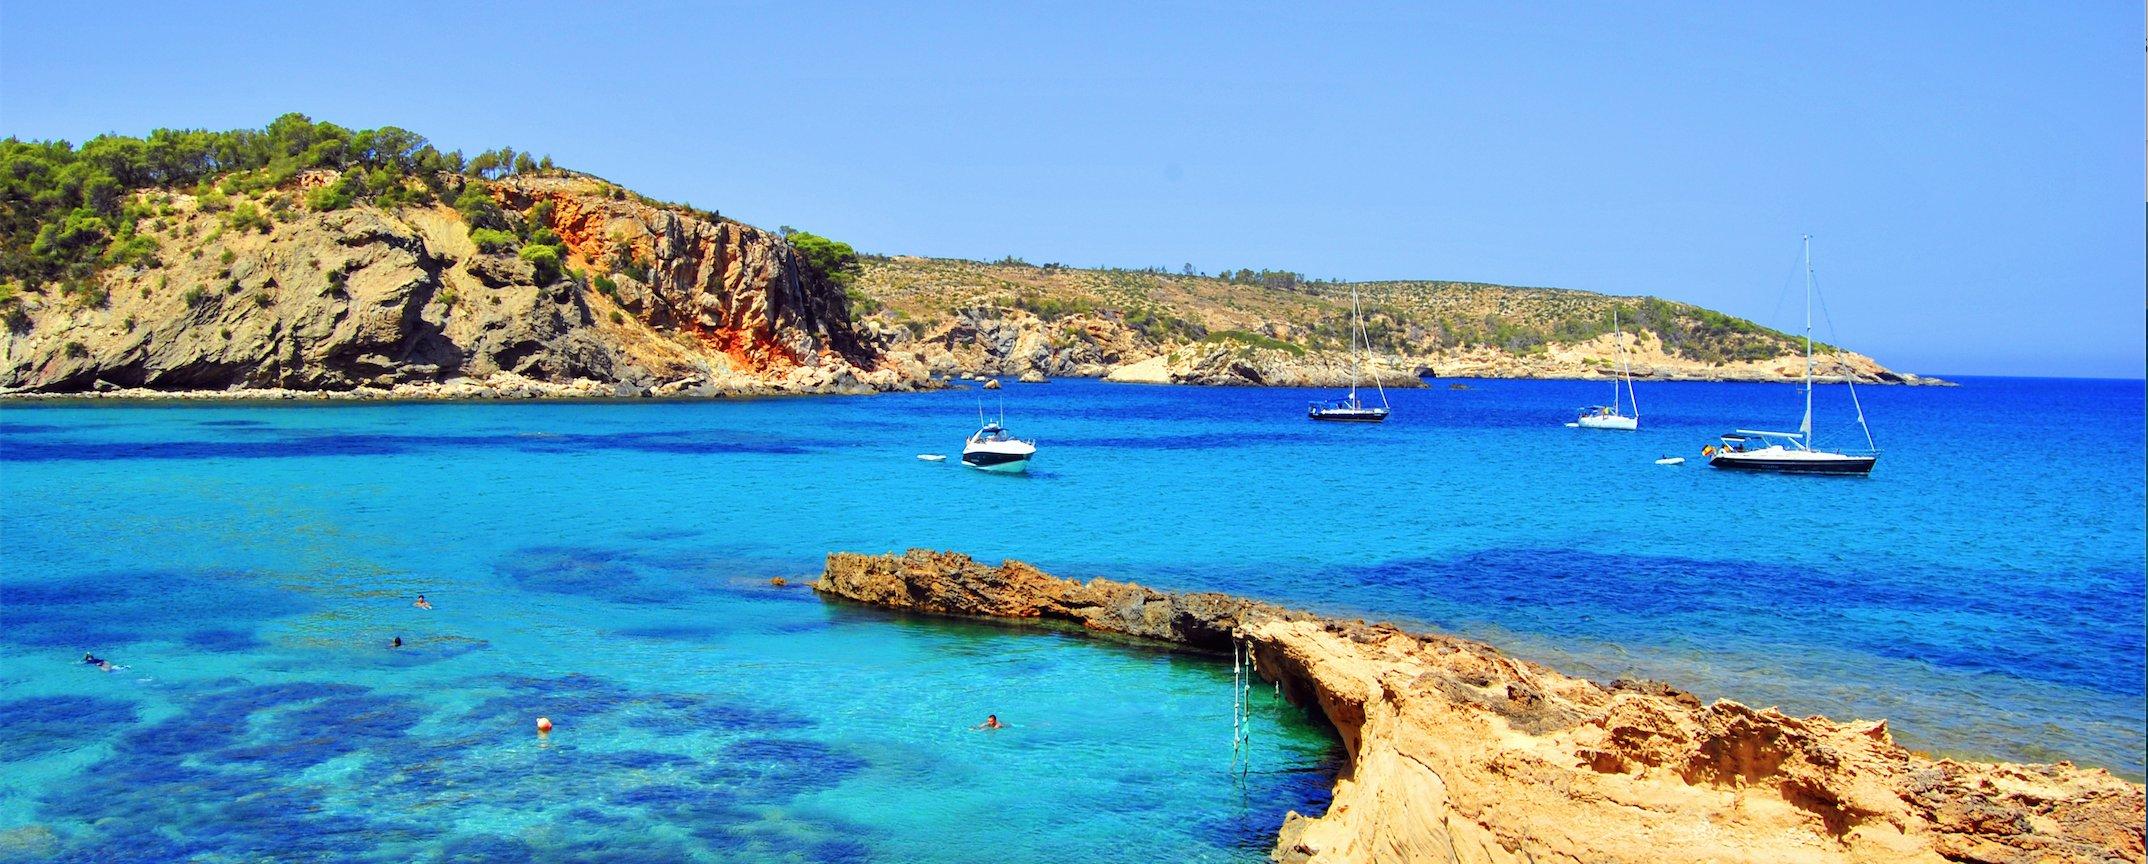 ibiza-yacht-charter-ibiza-boat-charter-ibiza-boat-rental-ibiza-yacht-rental-ibiza-sailing-charter-eivissa-baleares-balearic-islands-spain